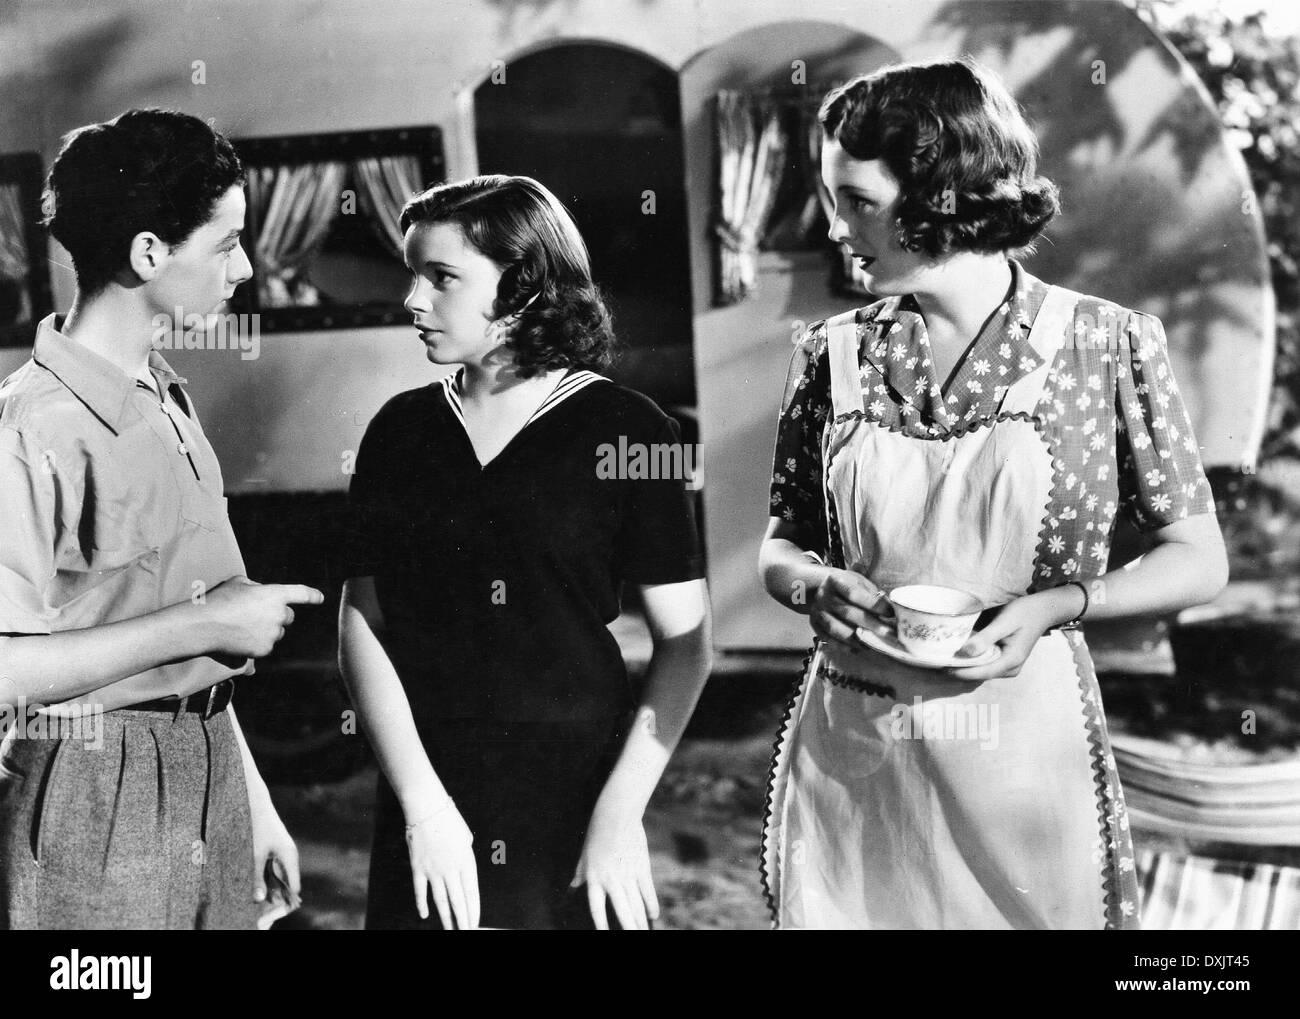 LISTEN, DARLING (US1938) FREDDIE BARTHOLOMEW, JUDY GARLAND, Stock Photo